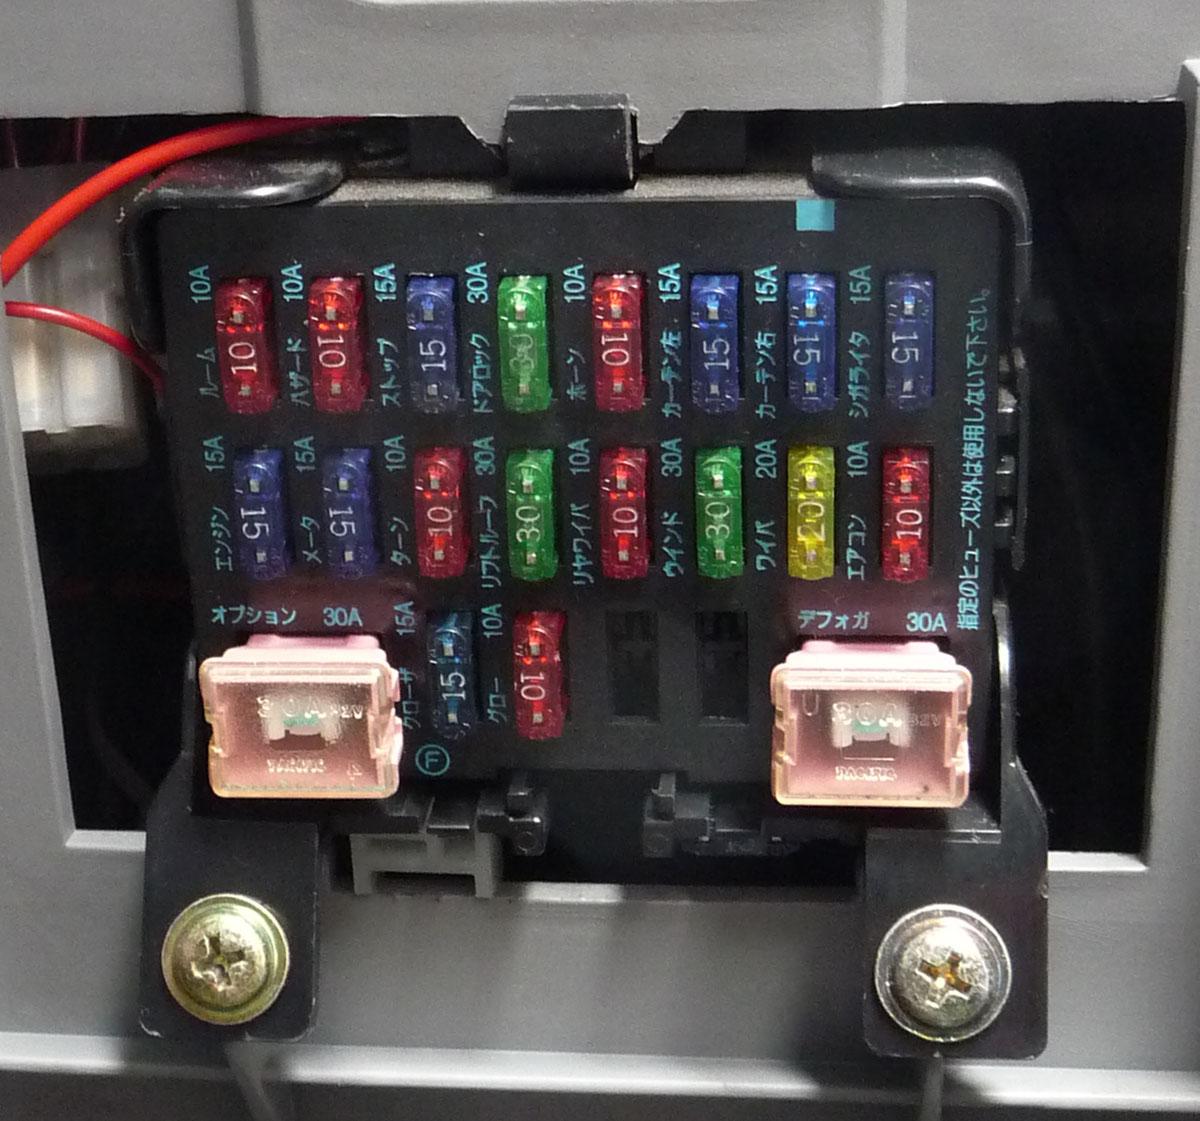 Admirable Plug Fuse Box Wiring Diagram Document Guide Wiring Cloud Apomsimijknierdonabenoleattemohammedshrineorg